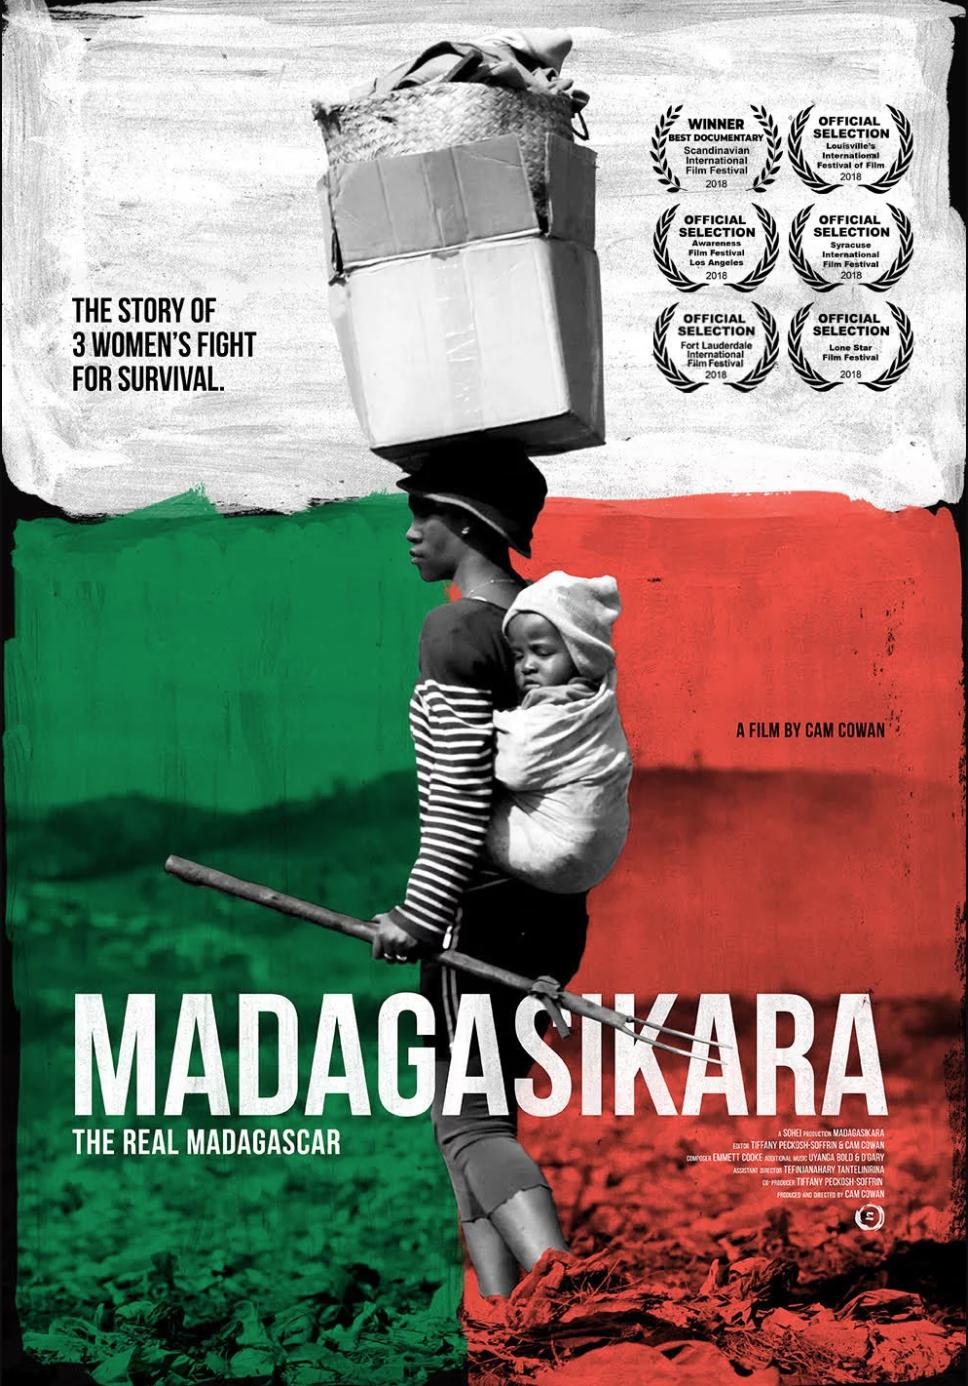 Image courtesy of http://www.madagasikarafilm.com/